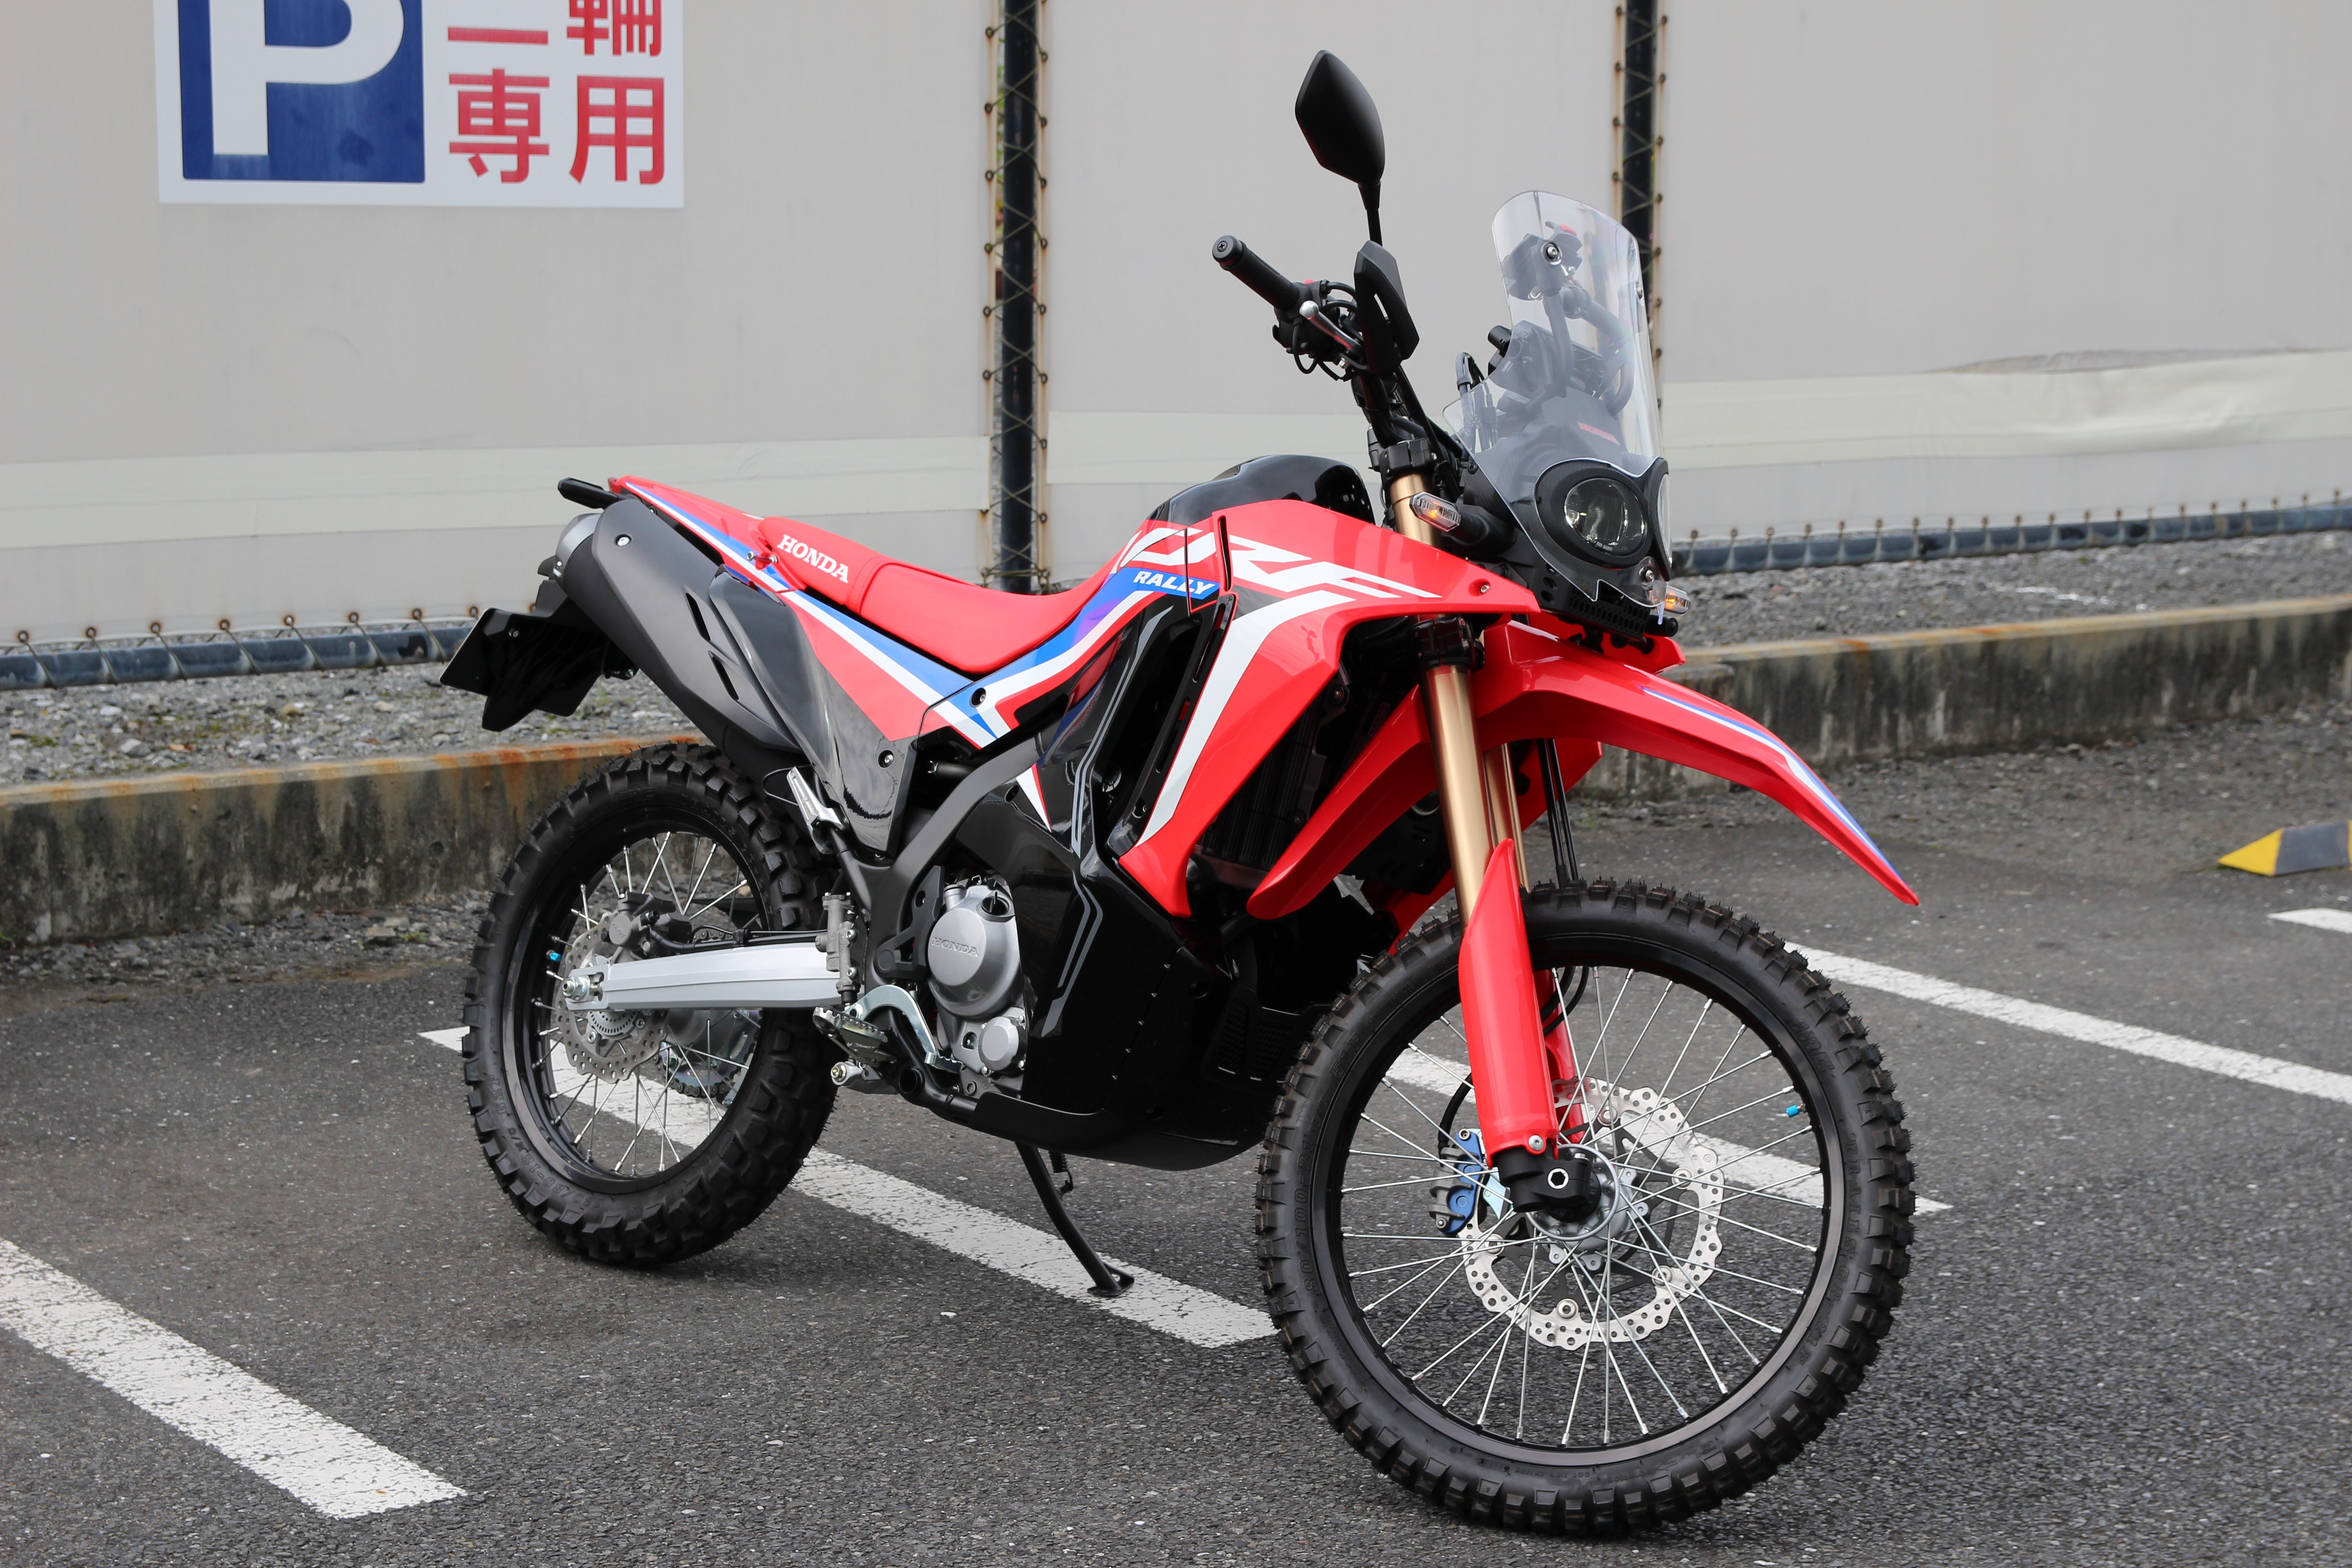 f:id:Tsubasaba:20210922151323j:image